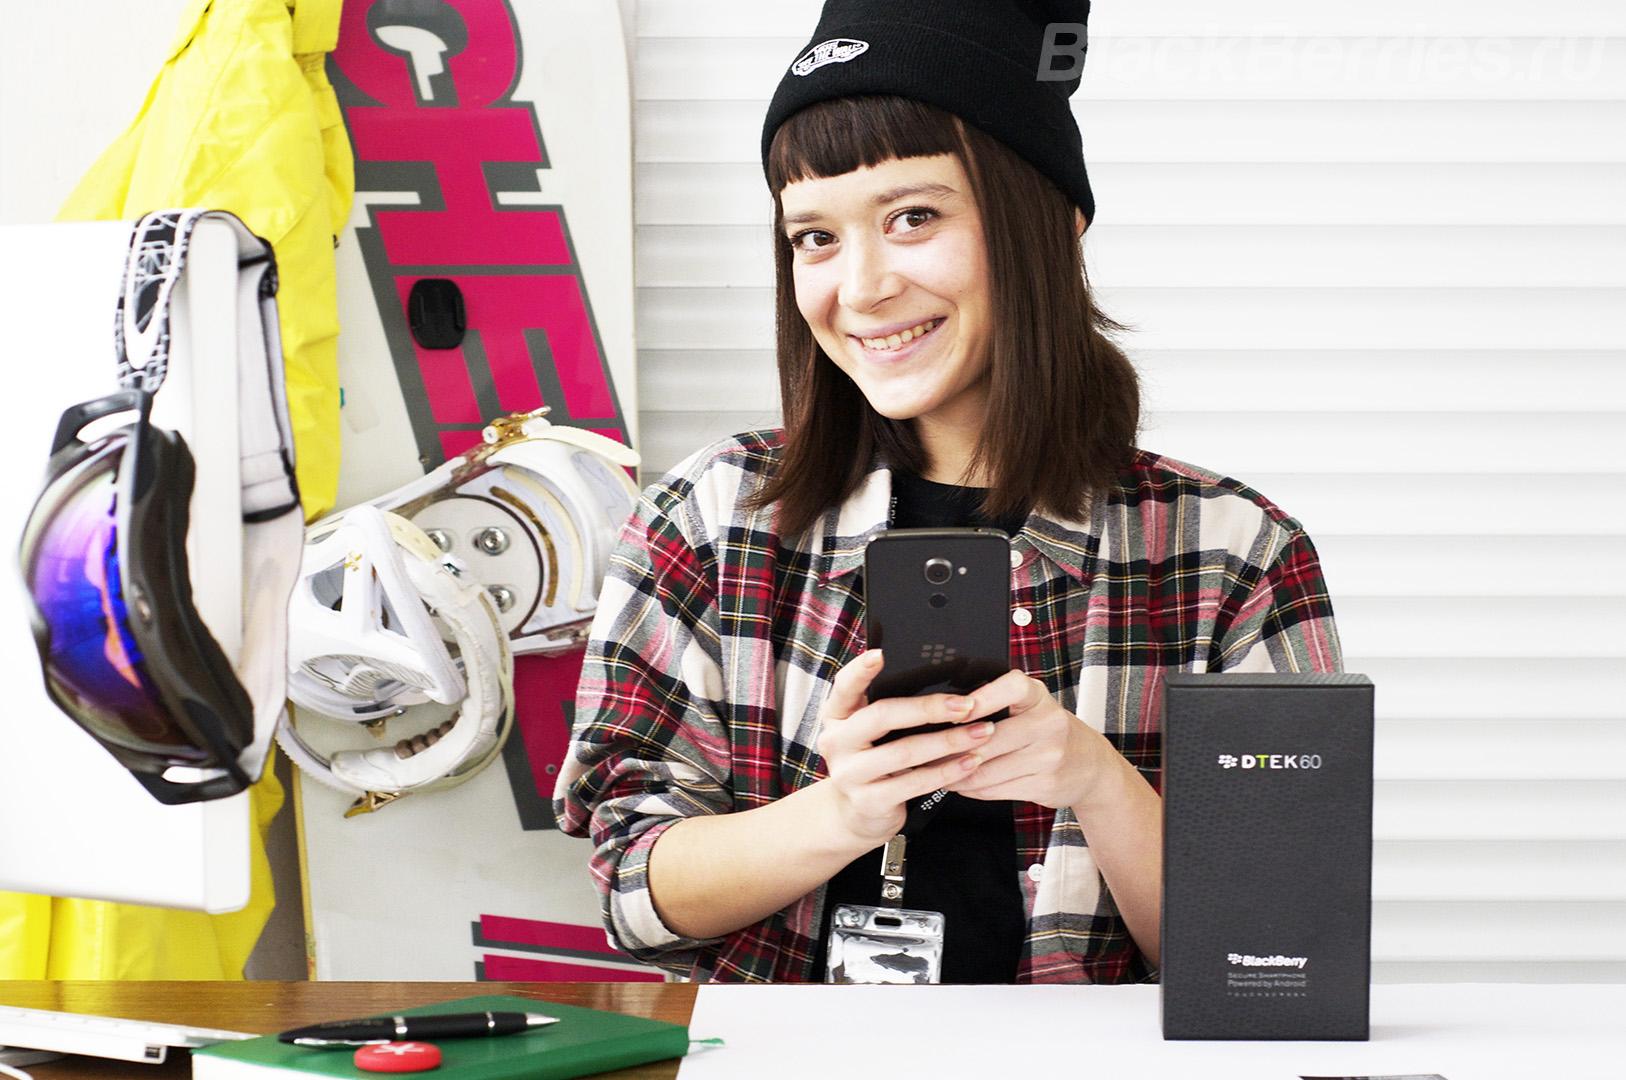 blackberry-dtek60-review-78